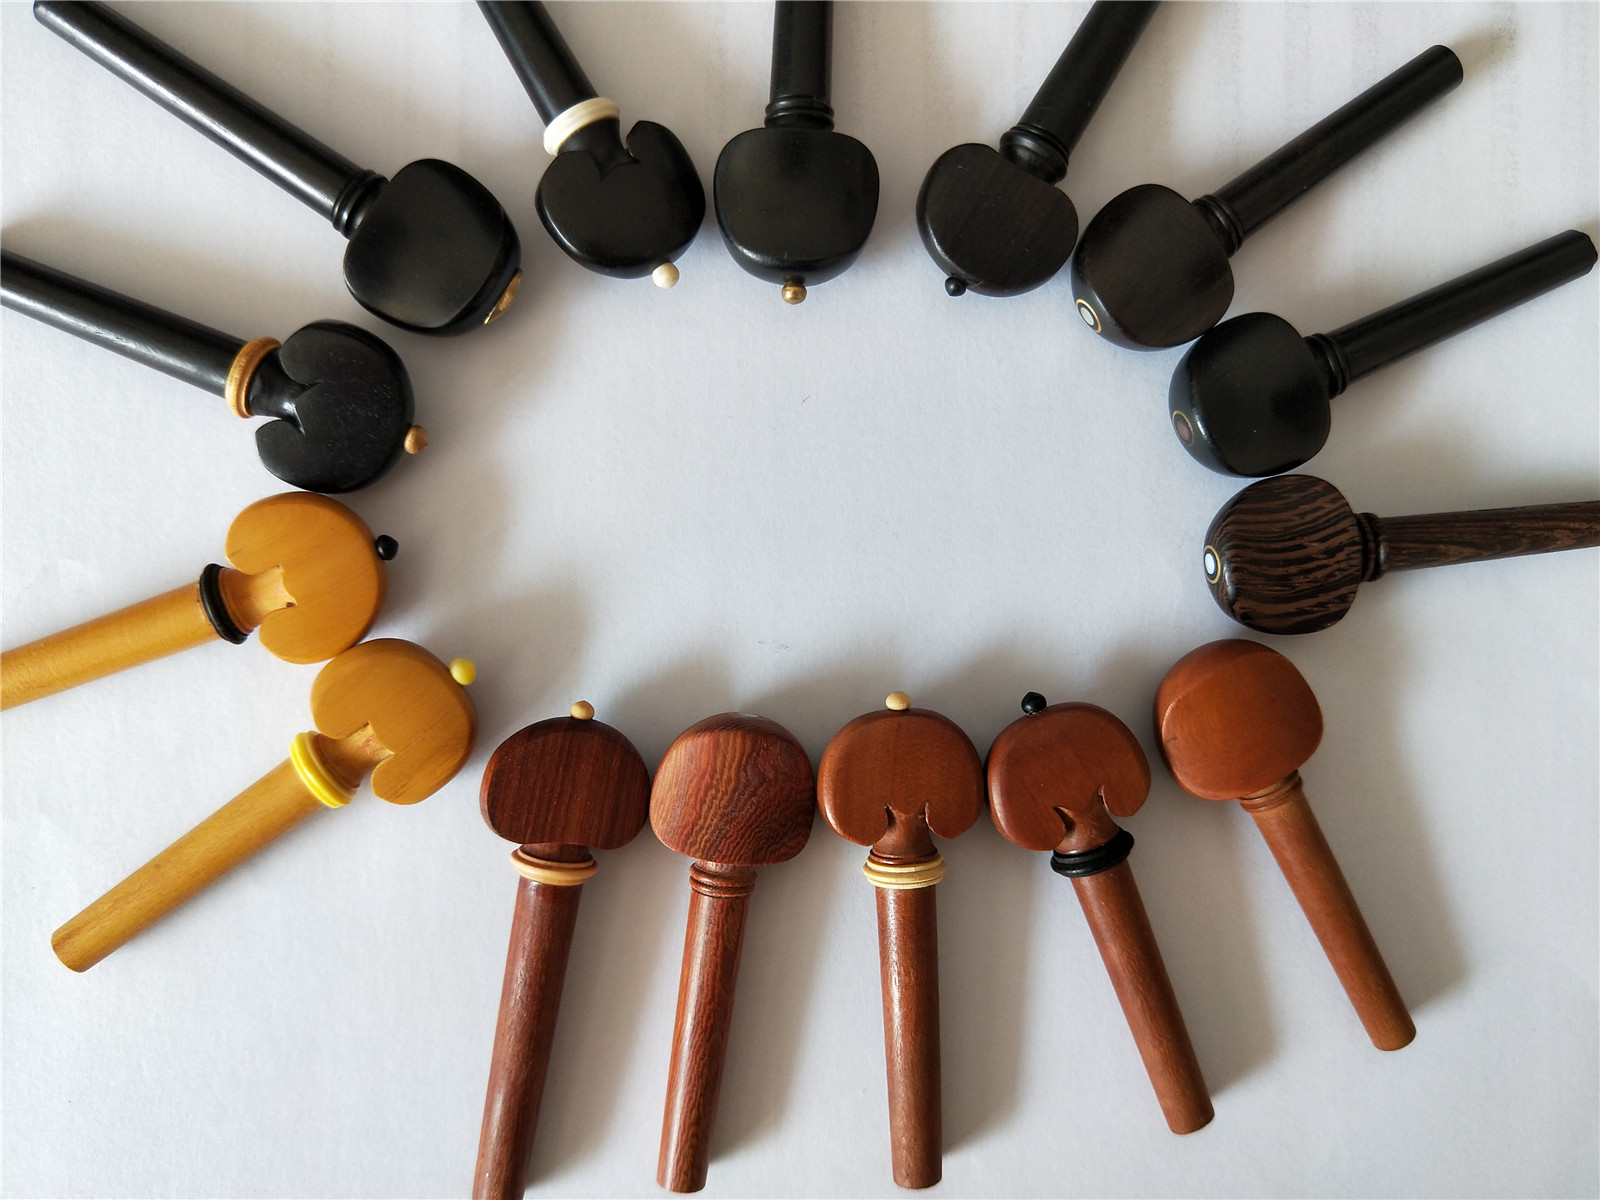 1 PC Quality Violin Peg 4/4 Different Wood Violin Parts